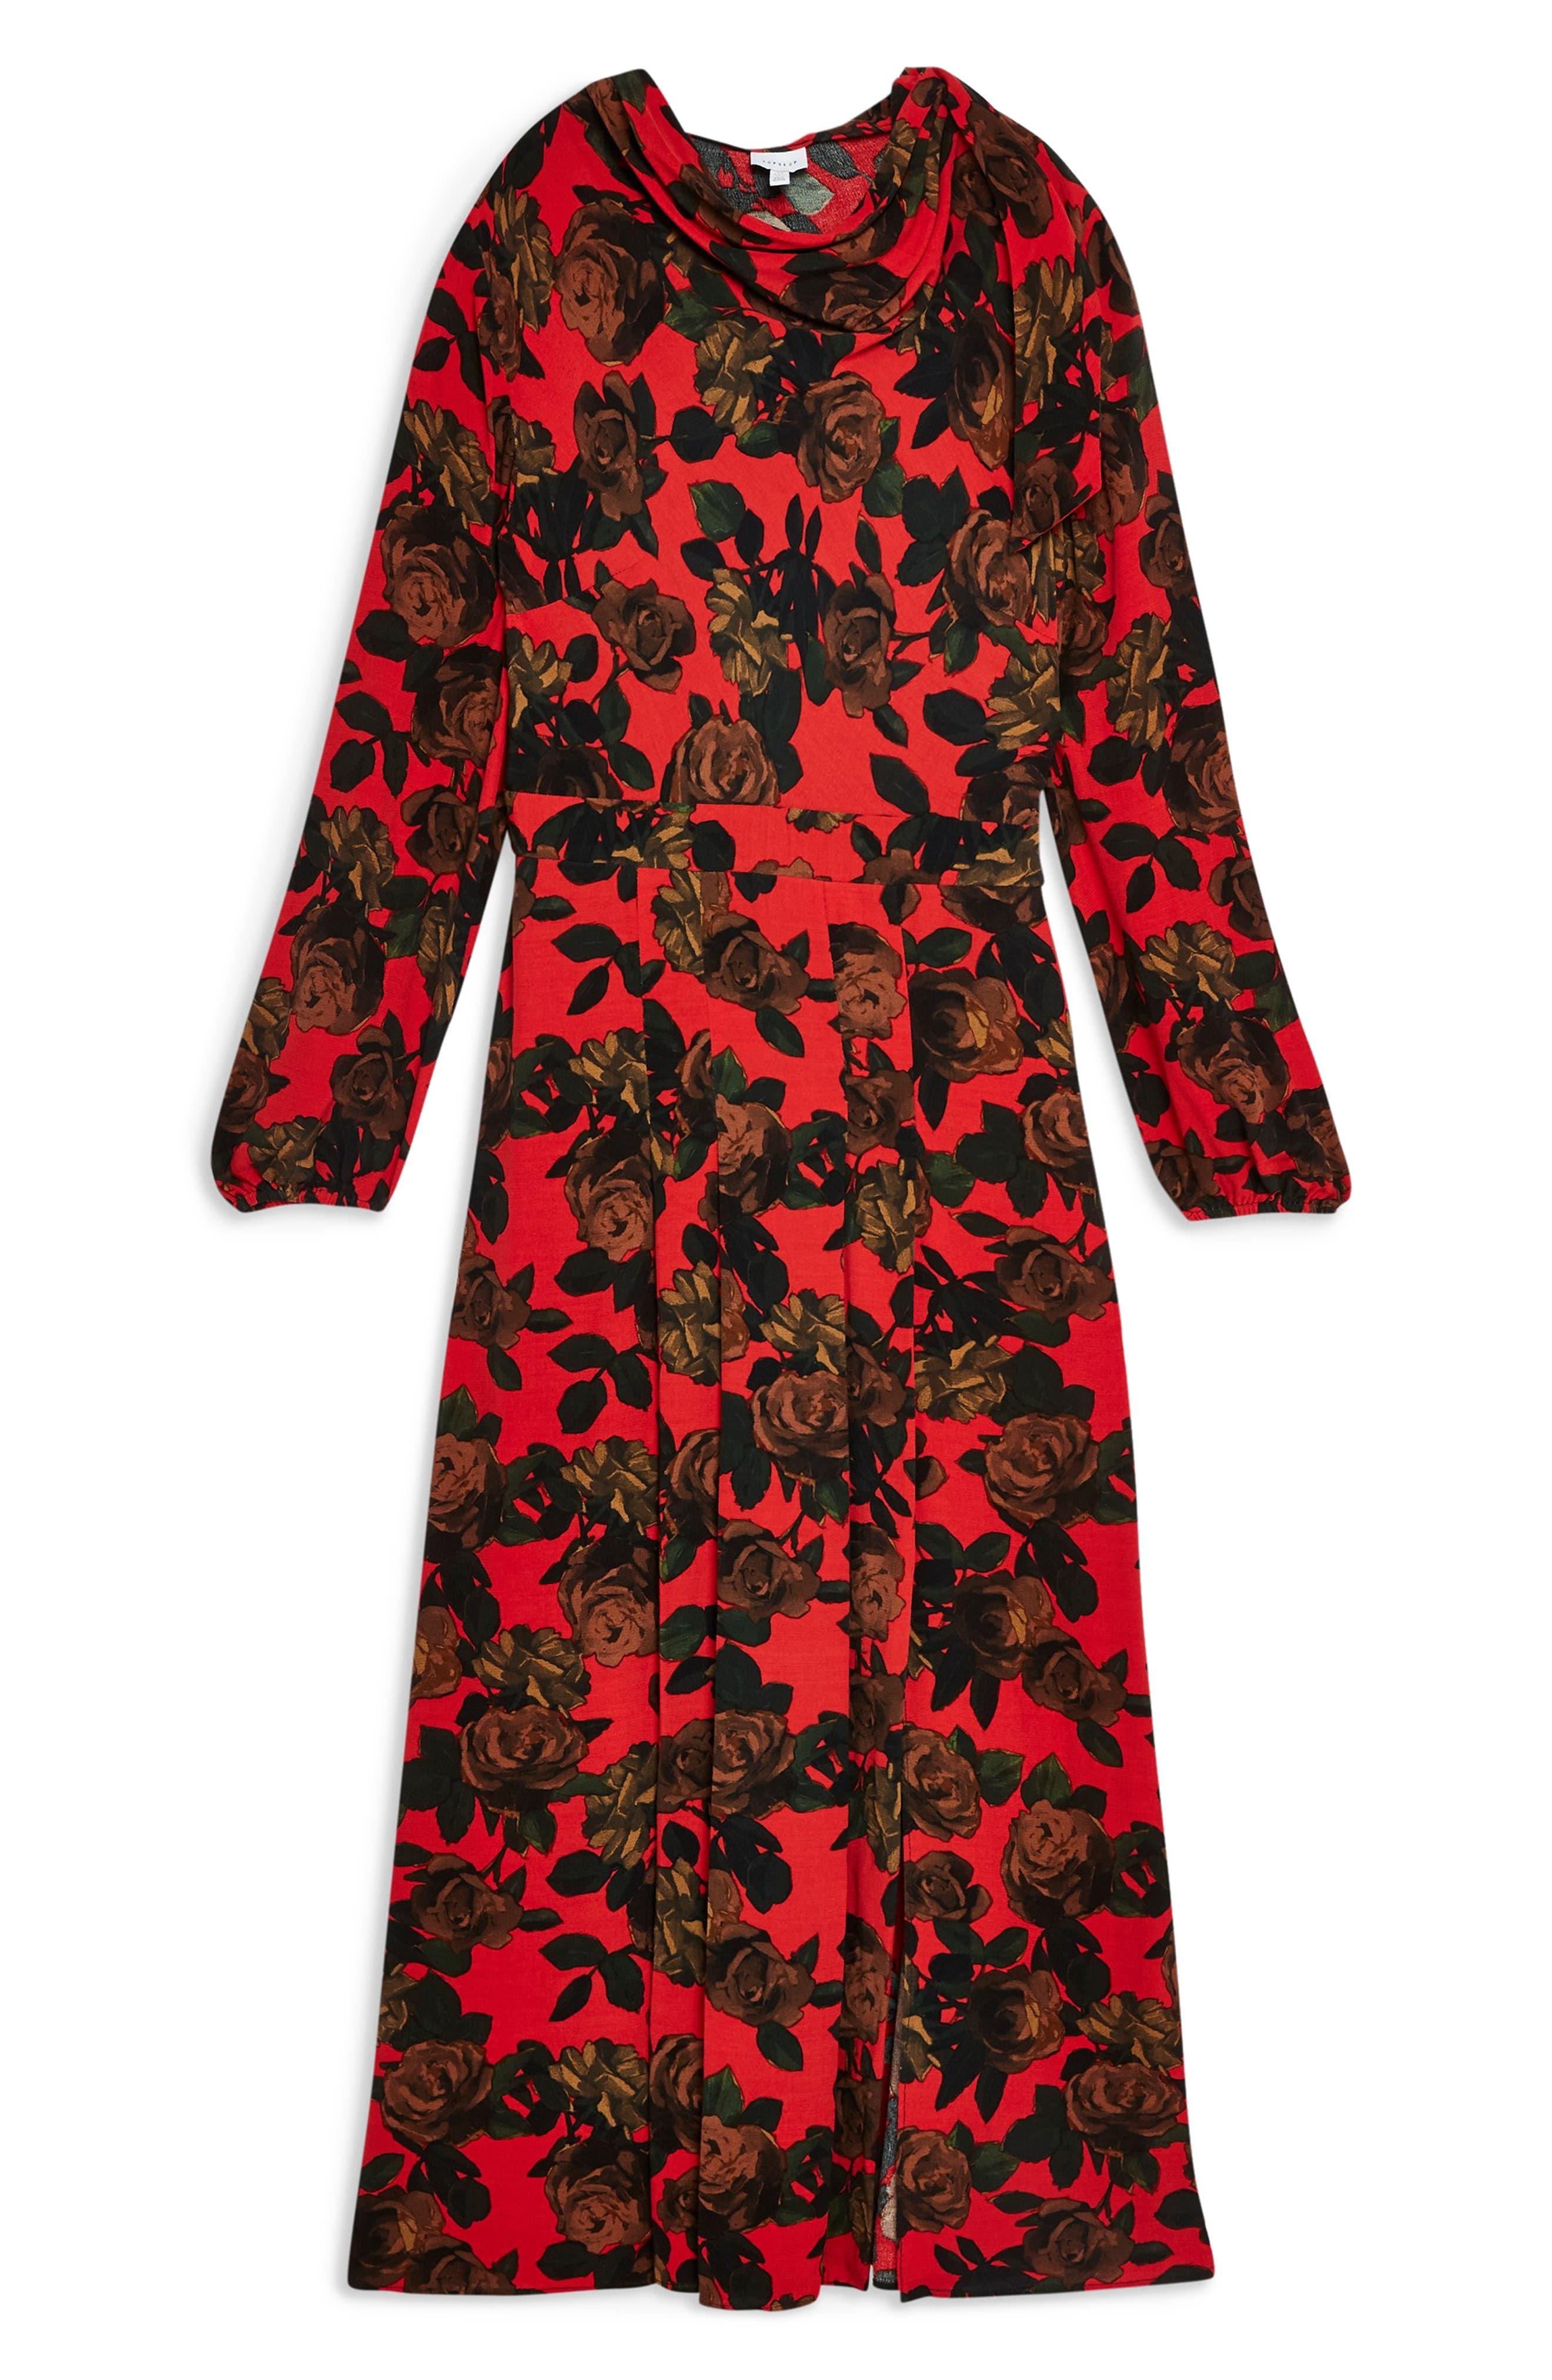 TOPSHOP,                             Rose Cut Tie Neck Midi Dress,                             Alternate thumbnail 6, color,                             RED MULTI